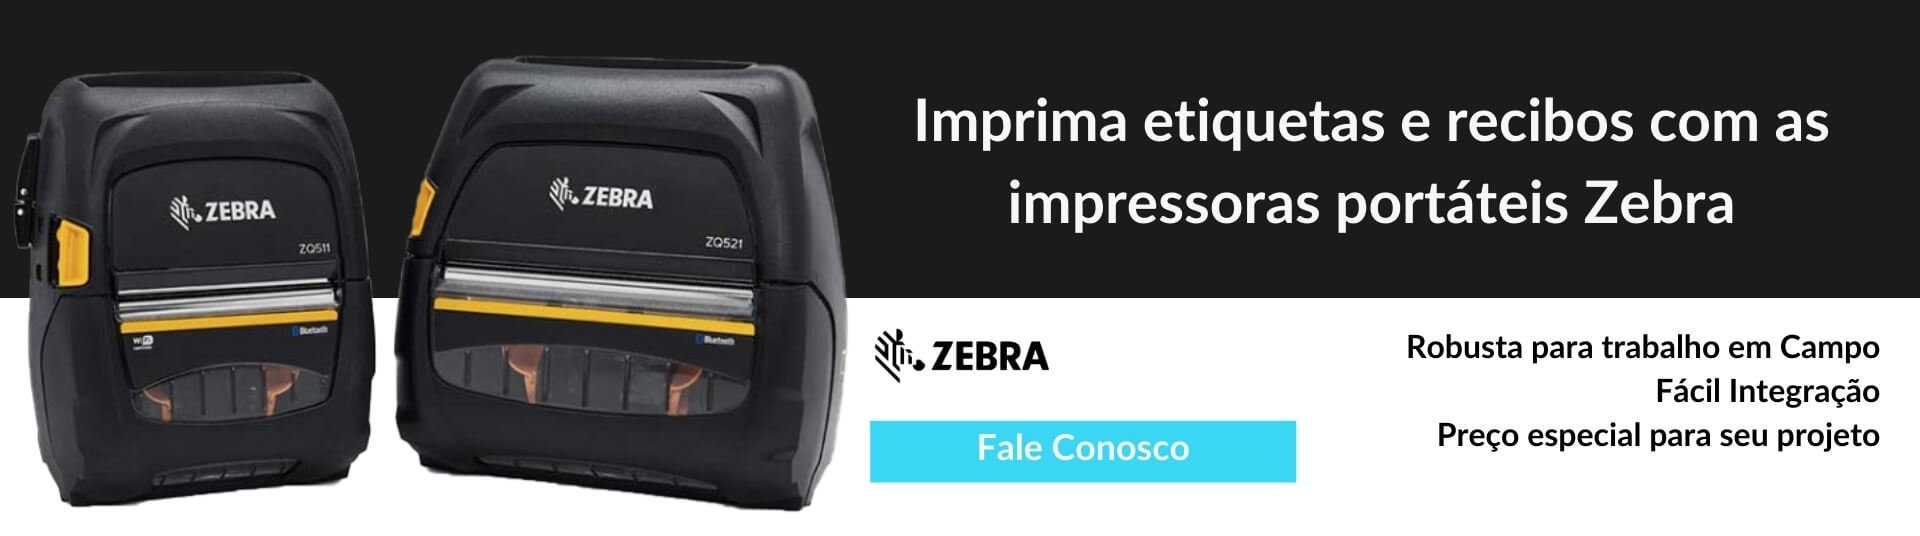 Impressora Portatil Zebra